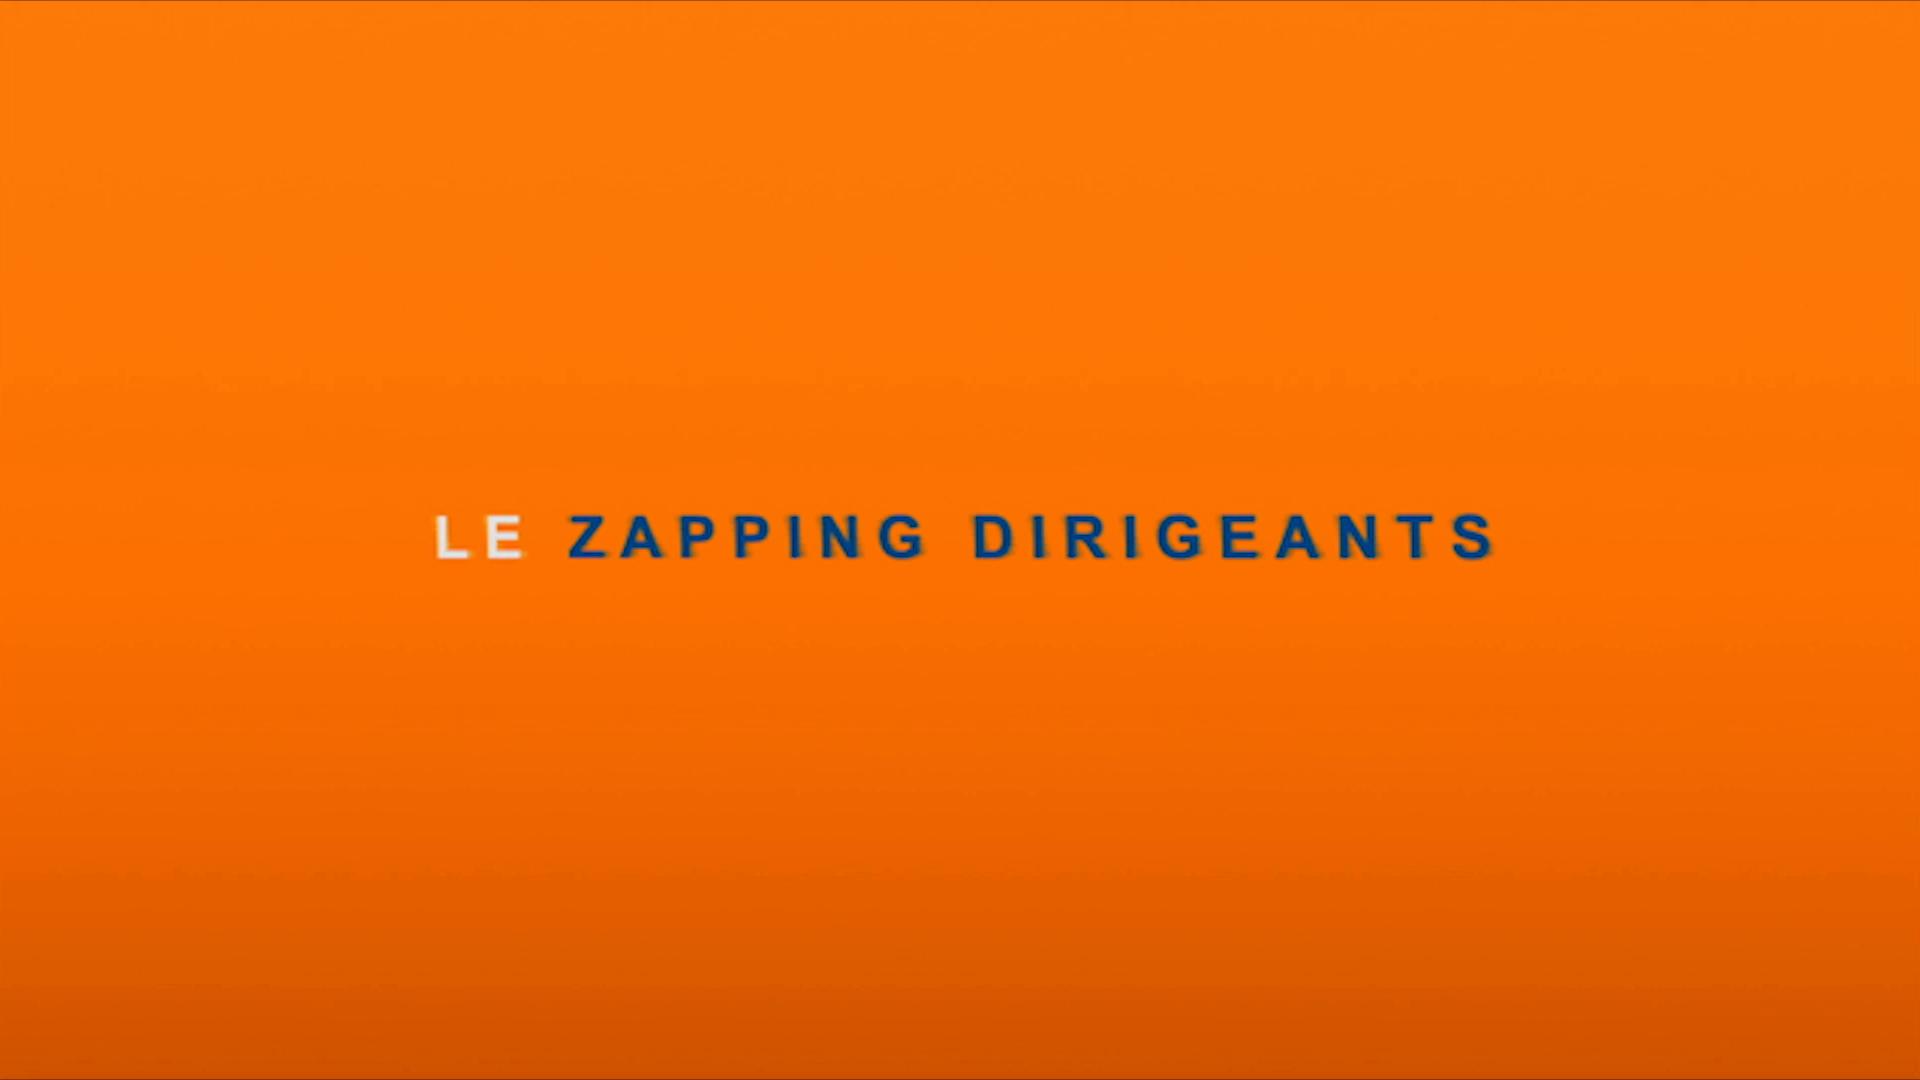 Zapping Dirigeants 2015 avec les dirigeants de Faurecia, McPhy, Manitou et GL events